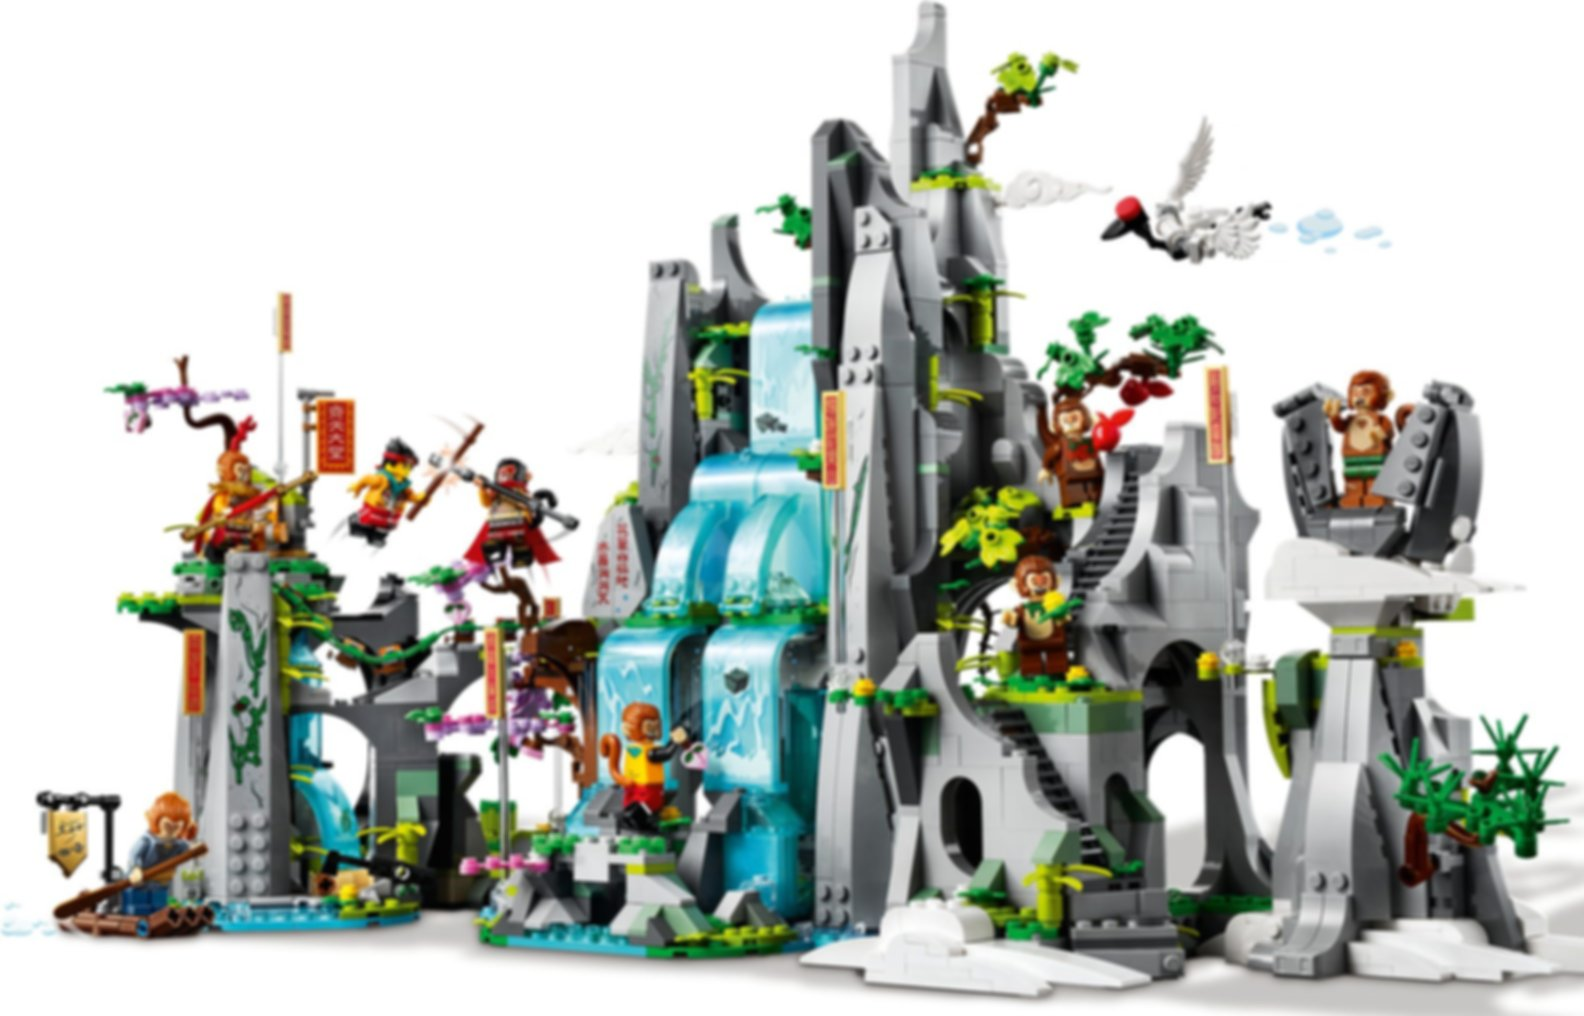 LEGO® Monkie Kid The Legendary Flower Fruit Mountain gameplay